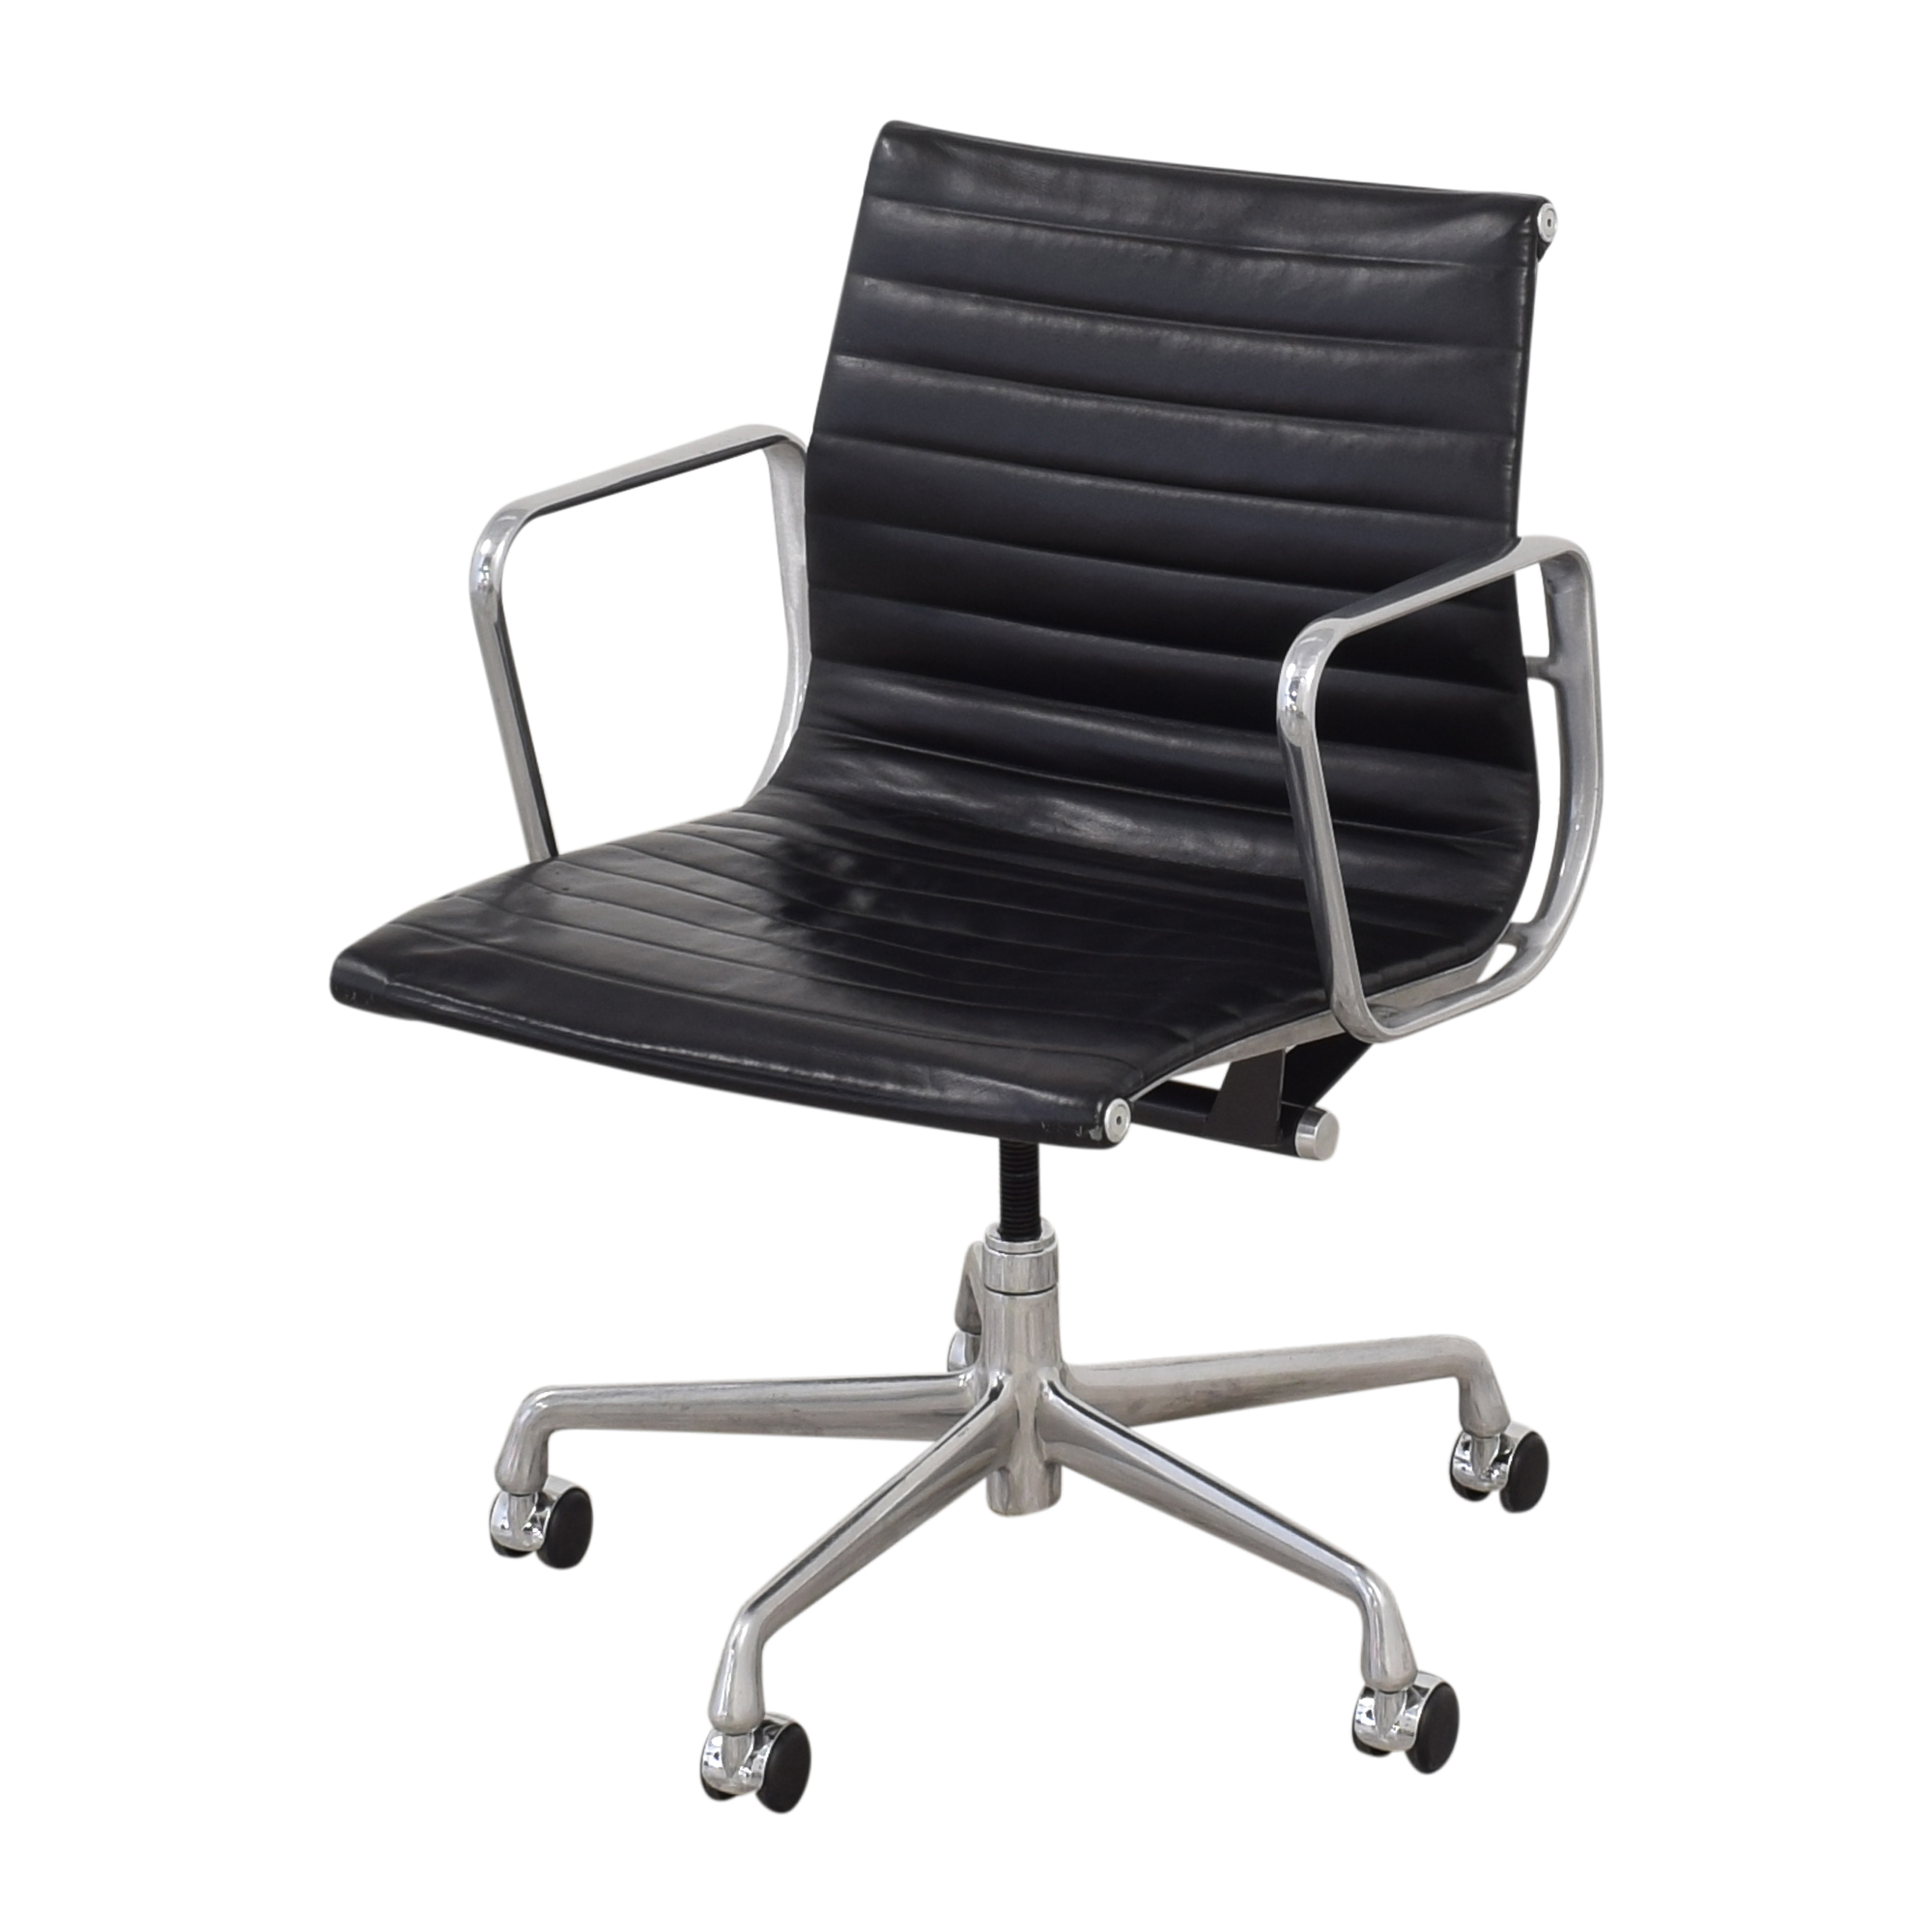 Herman Miller Herman Miller Eames Aluminum Group Management Chair nj